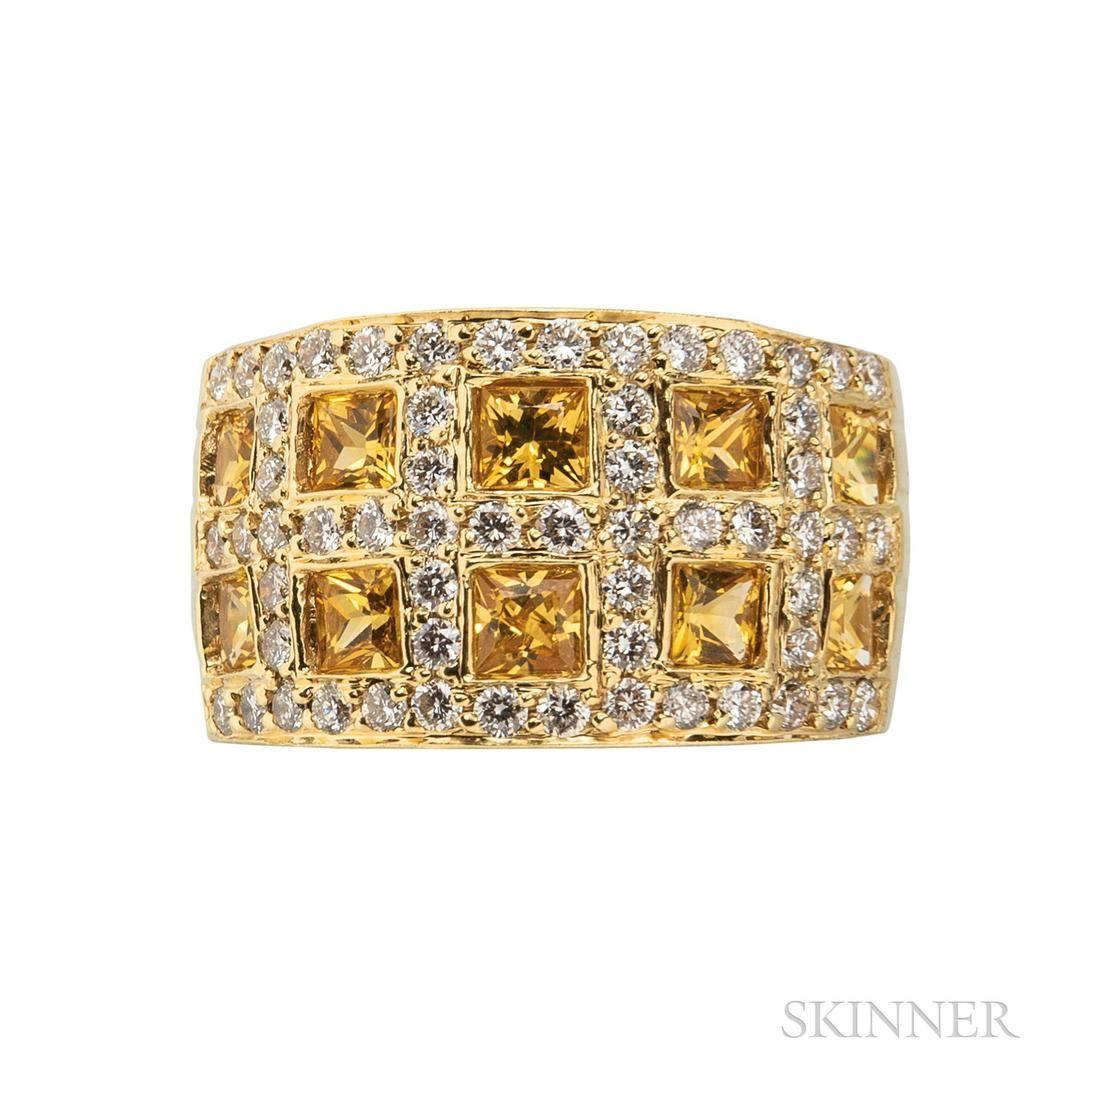 18kt Gold, Diamond, and Gem-set Ring